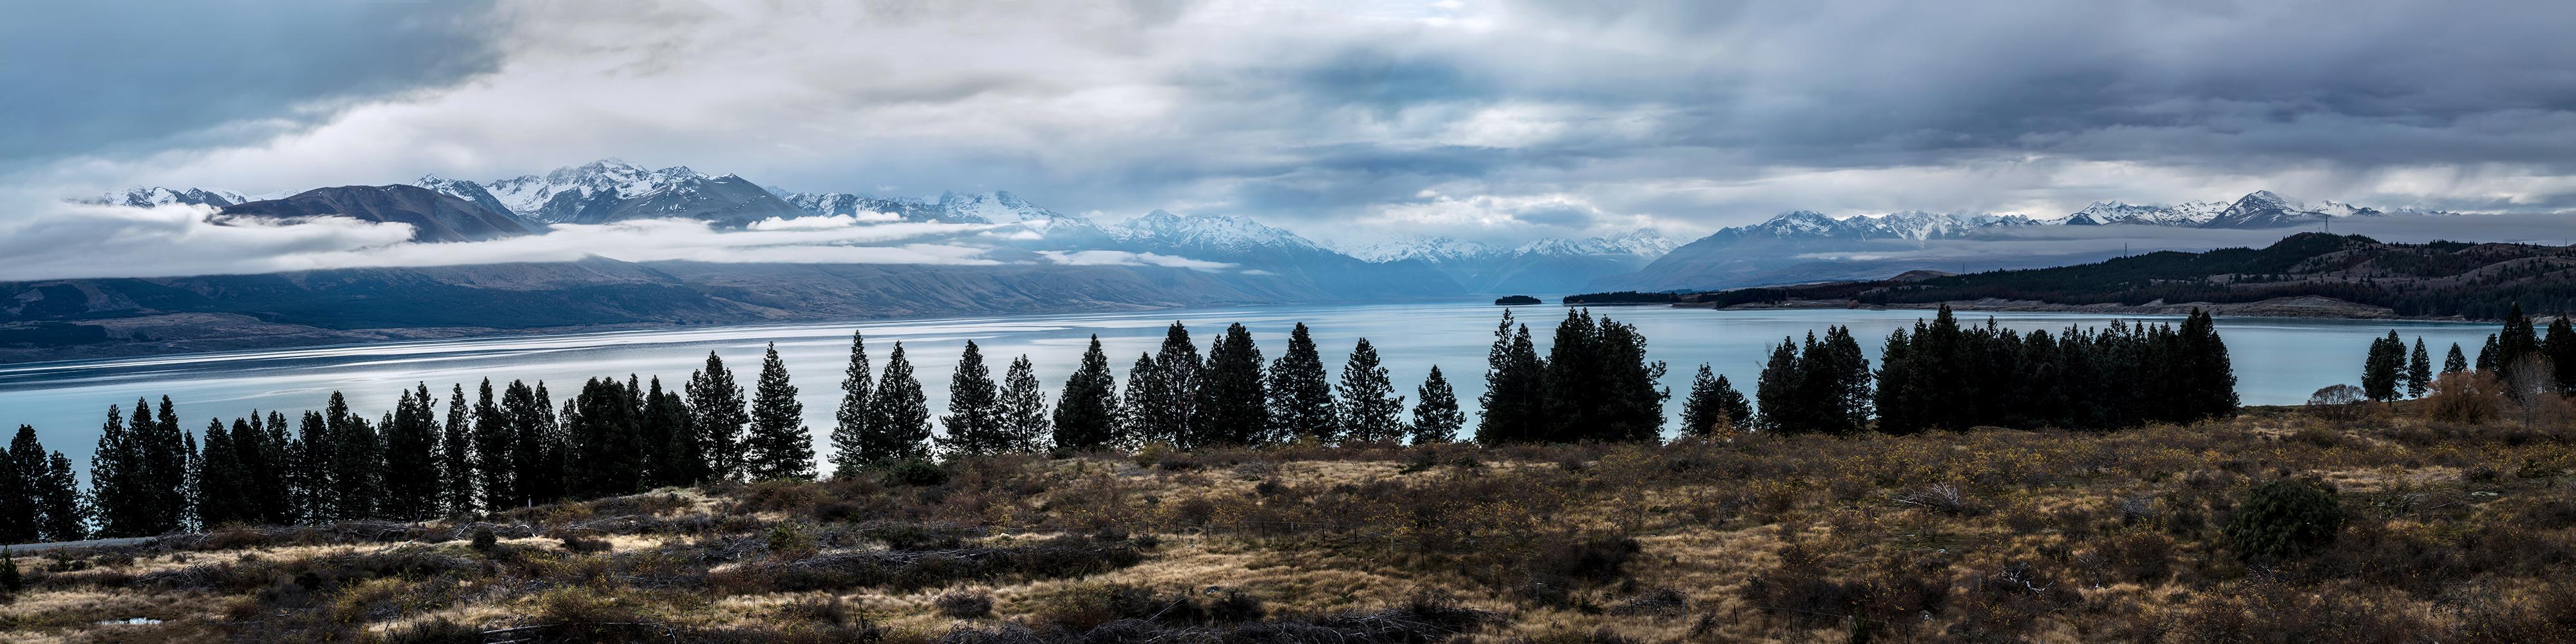 Overviewing Lake Pukaki